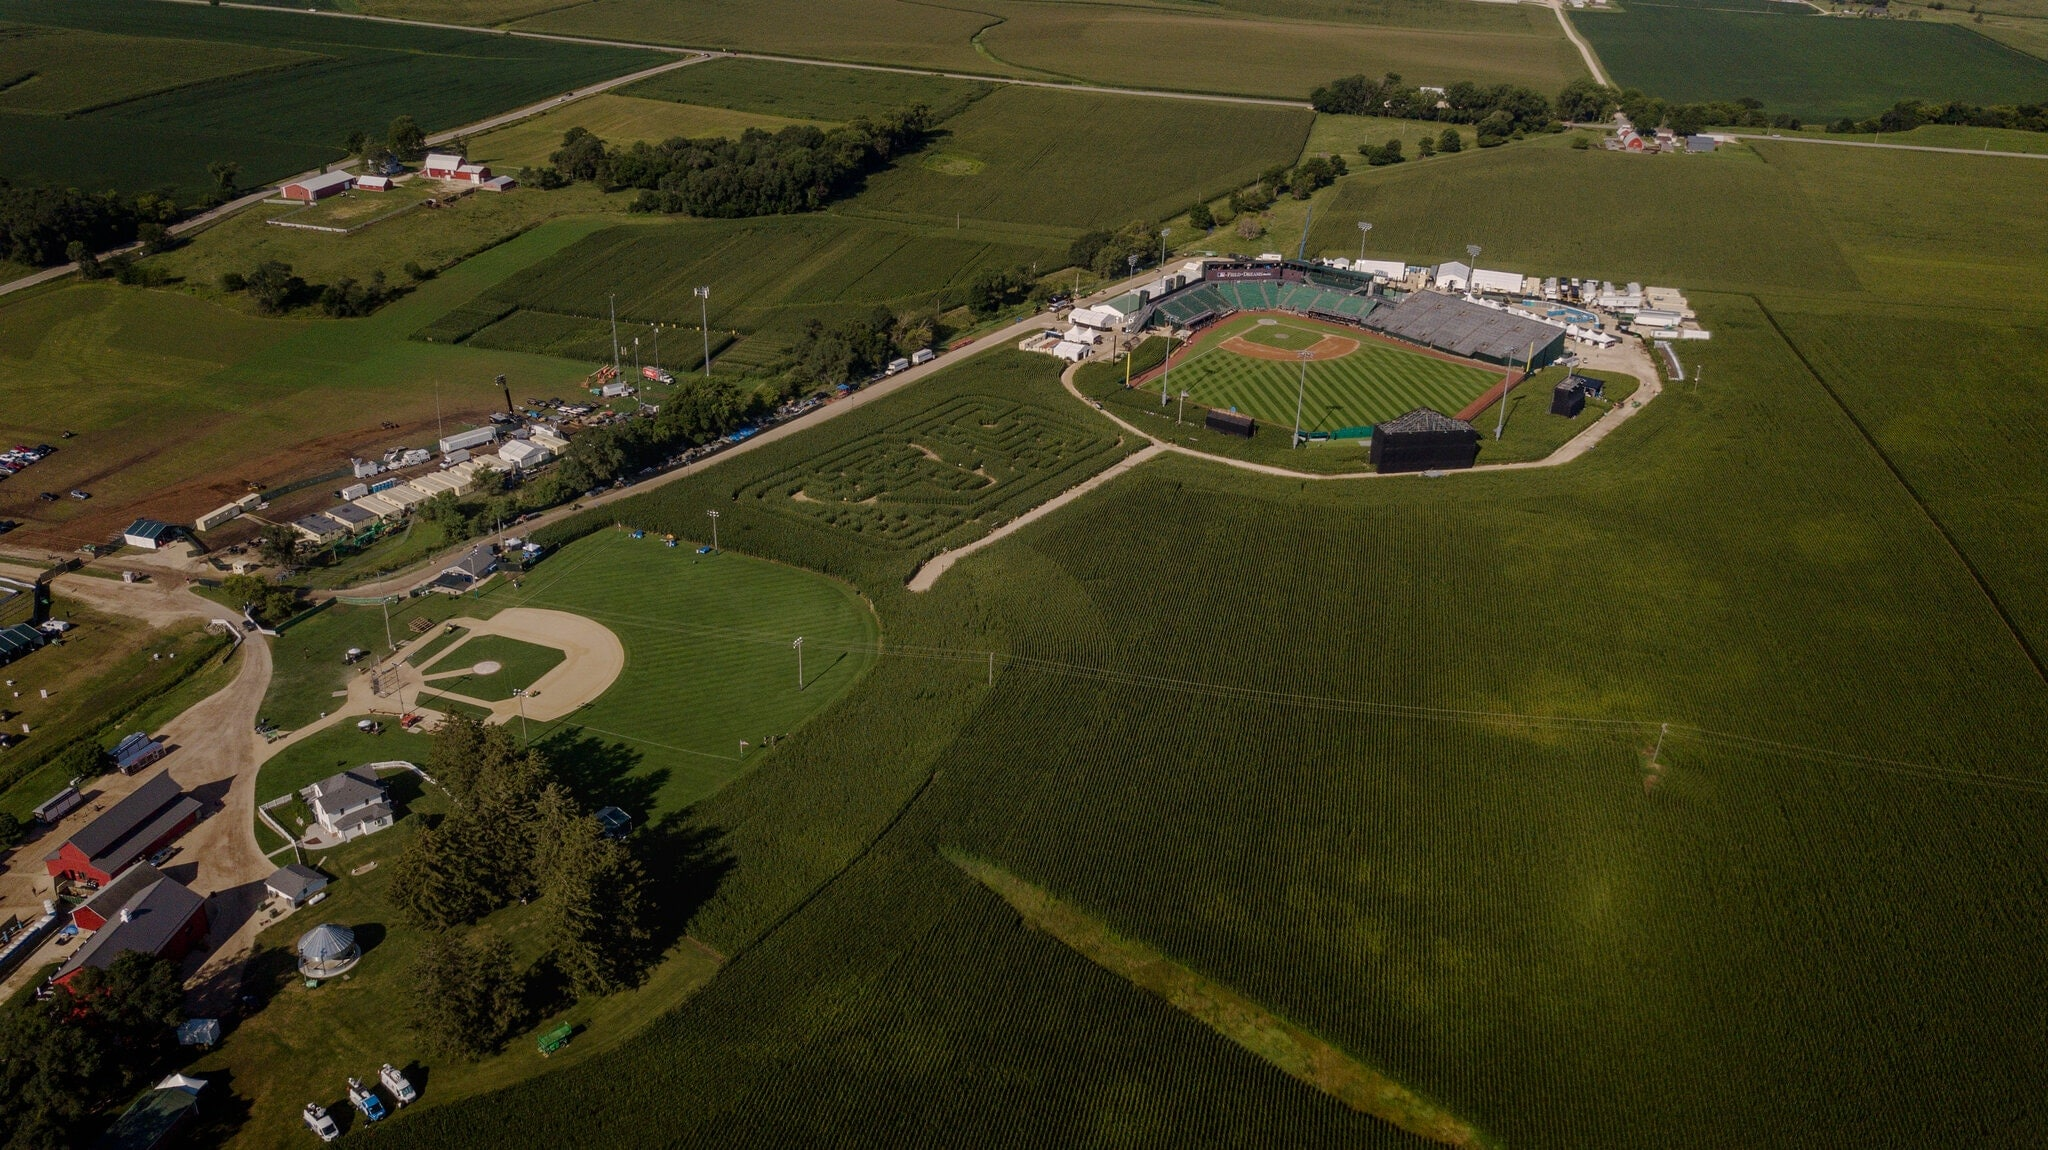 Le match Field of dreams de la MLB